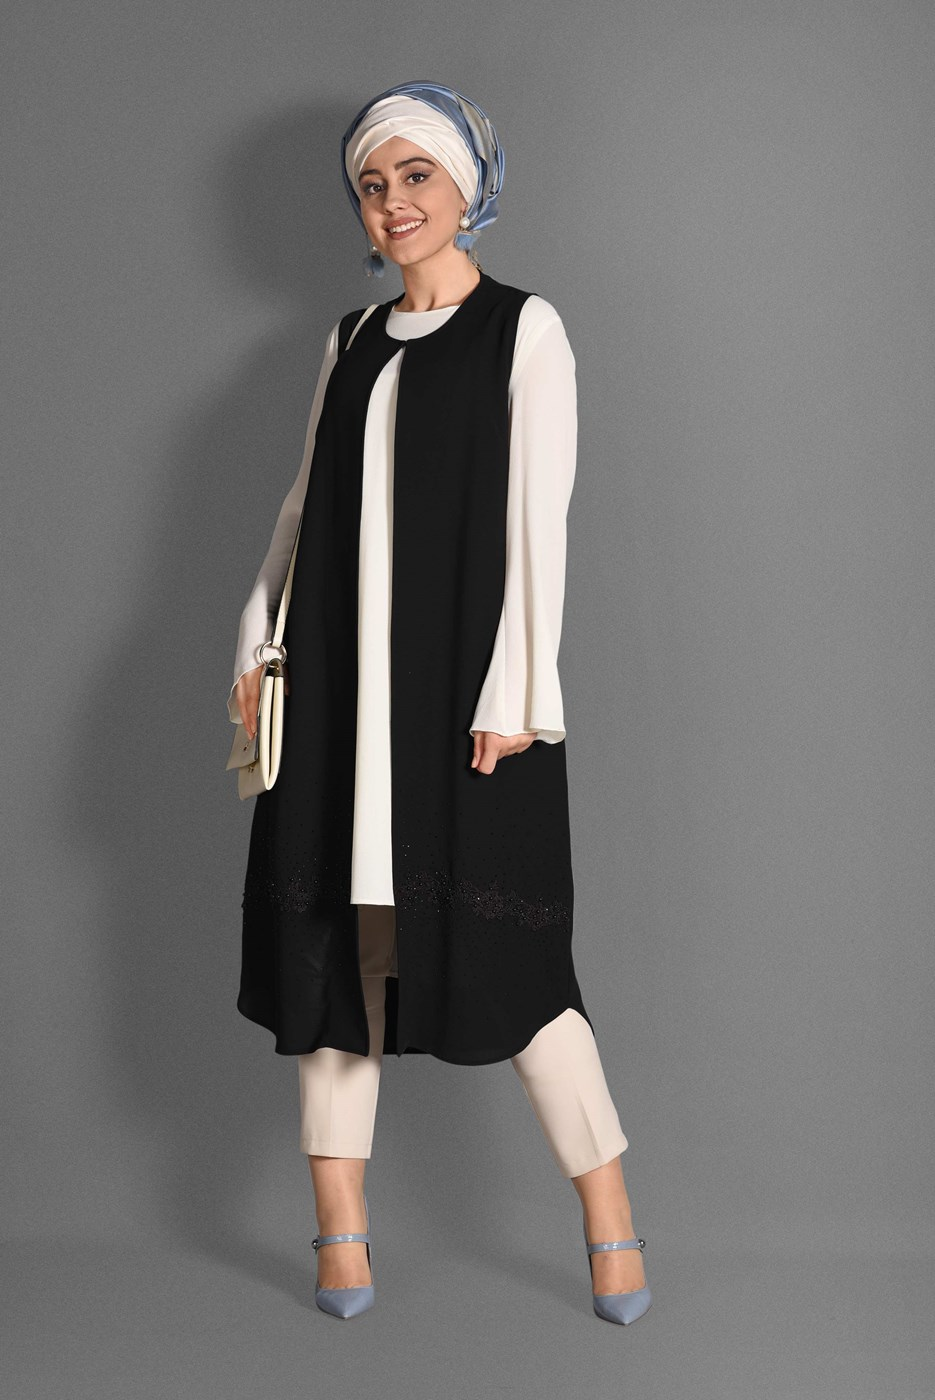 Femelle NOIR T 4537 Milas 2′Lİ Tesettür Tunik-Alv Fashion